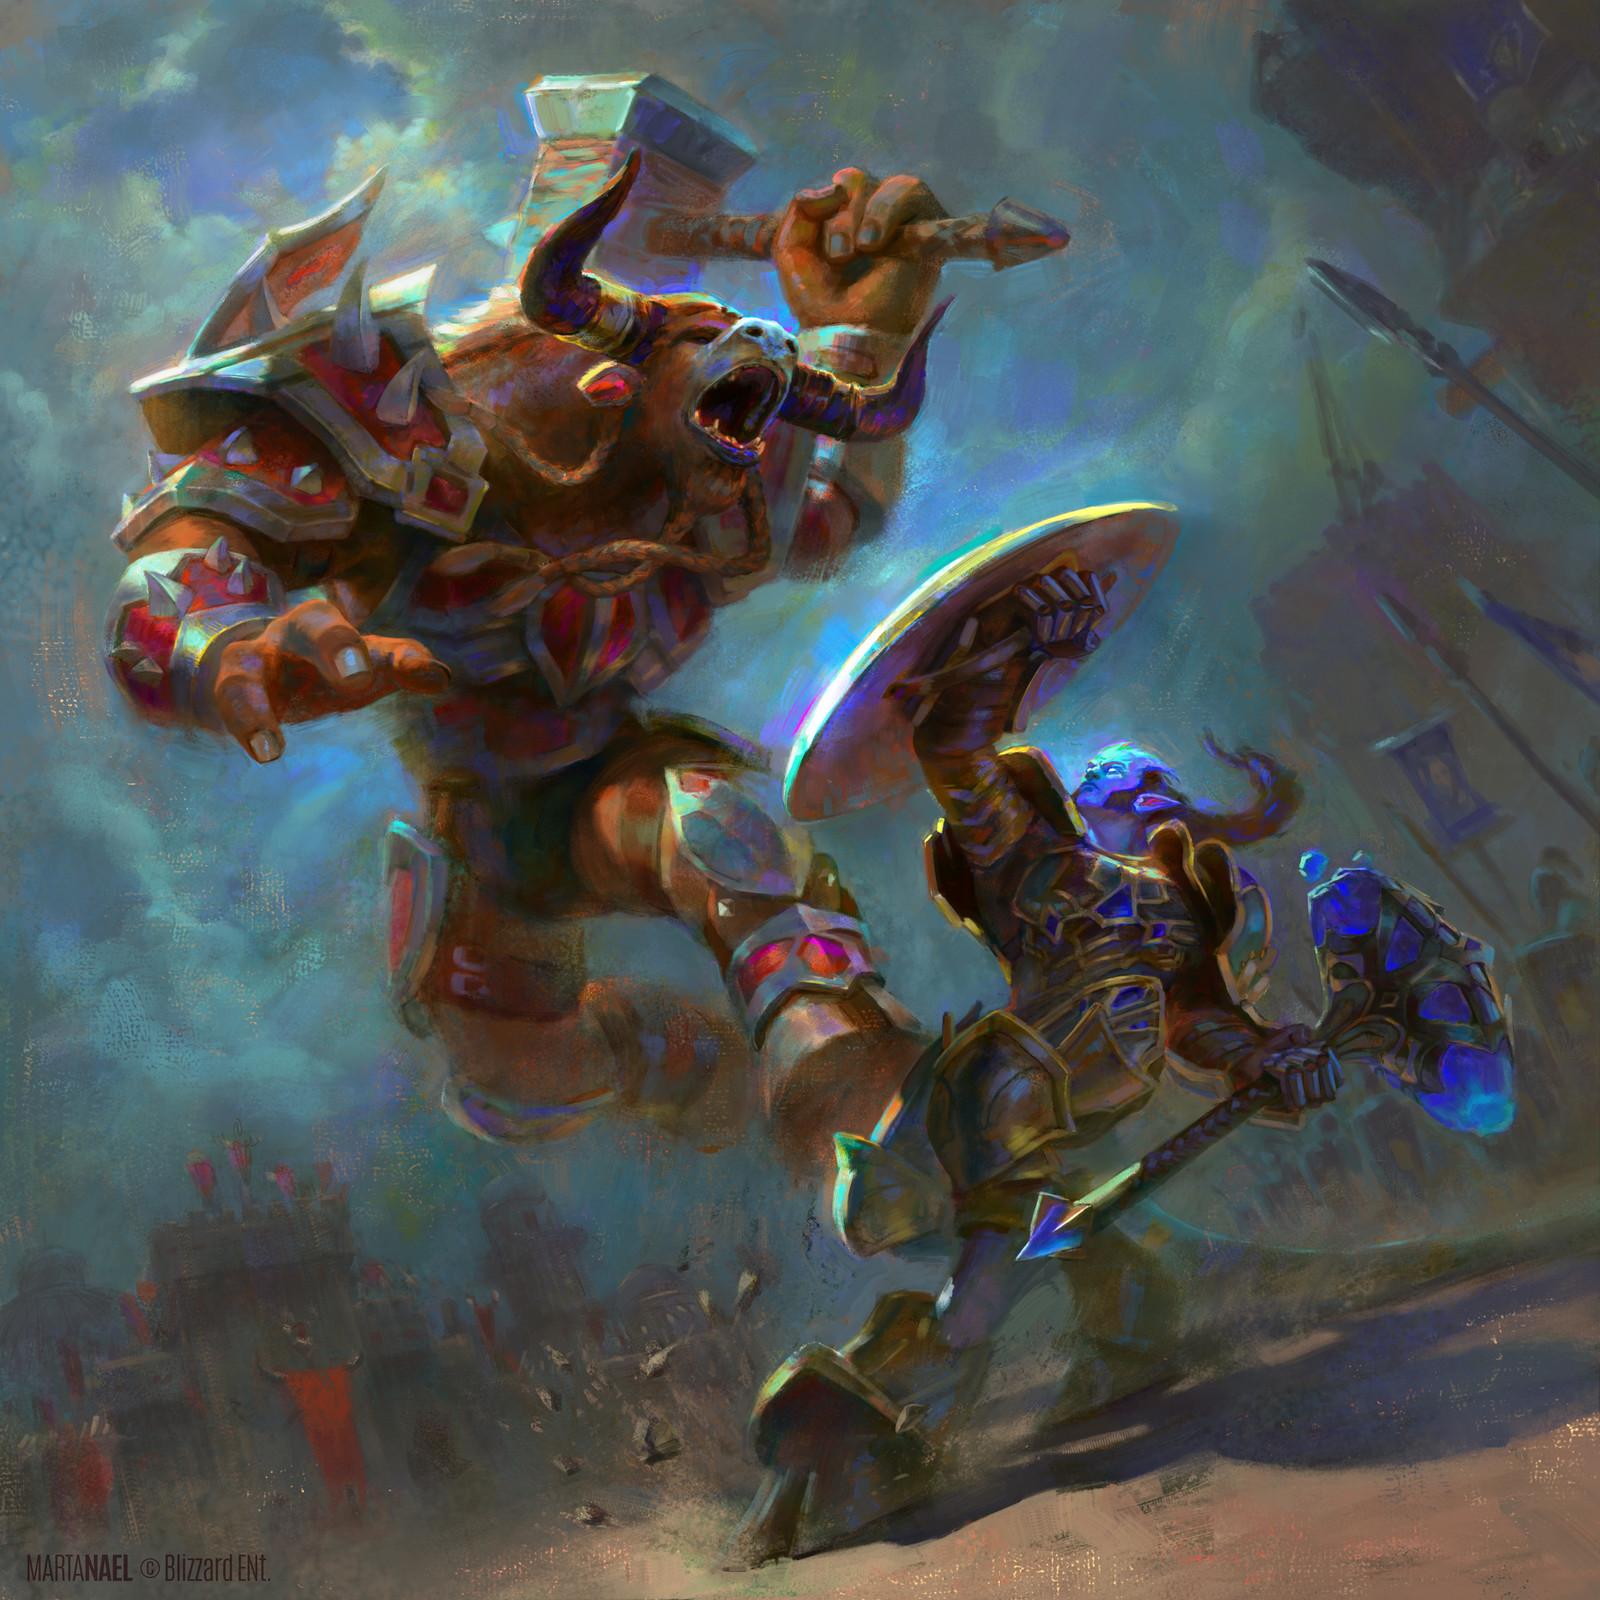 World of Warcraft - Battle for Azeroth: Tauren vs. Draenei